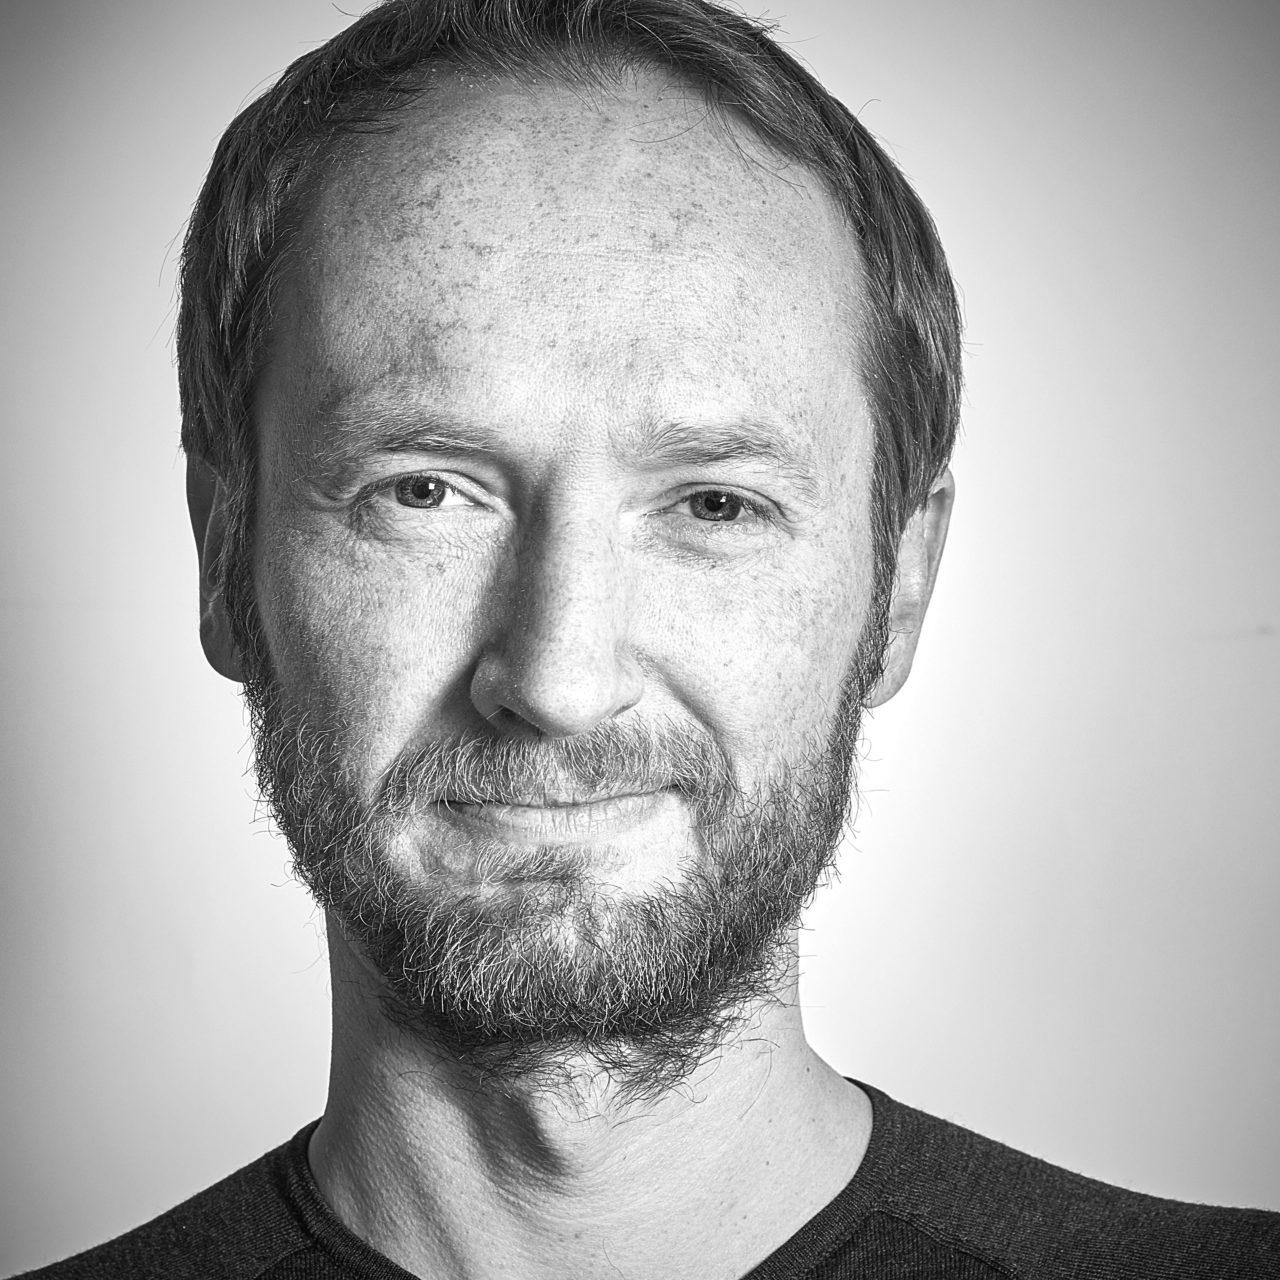 Peter Bilak, teacher at TypeMedia Royal Academy of Art The Hague